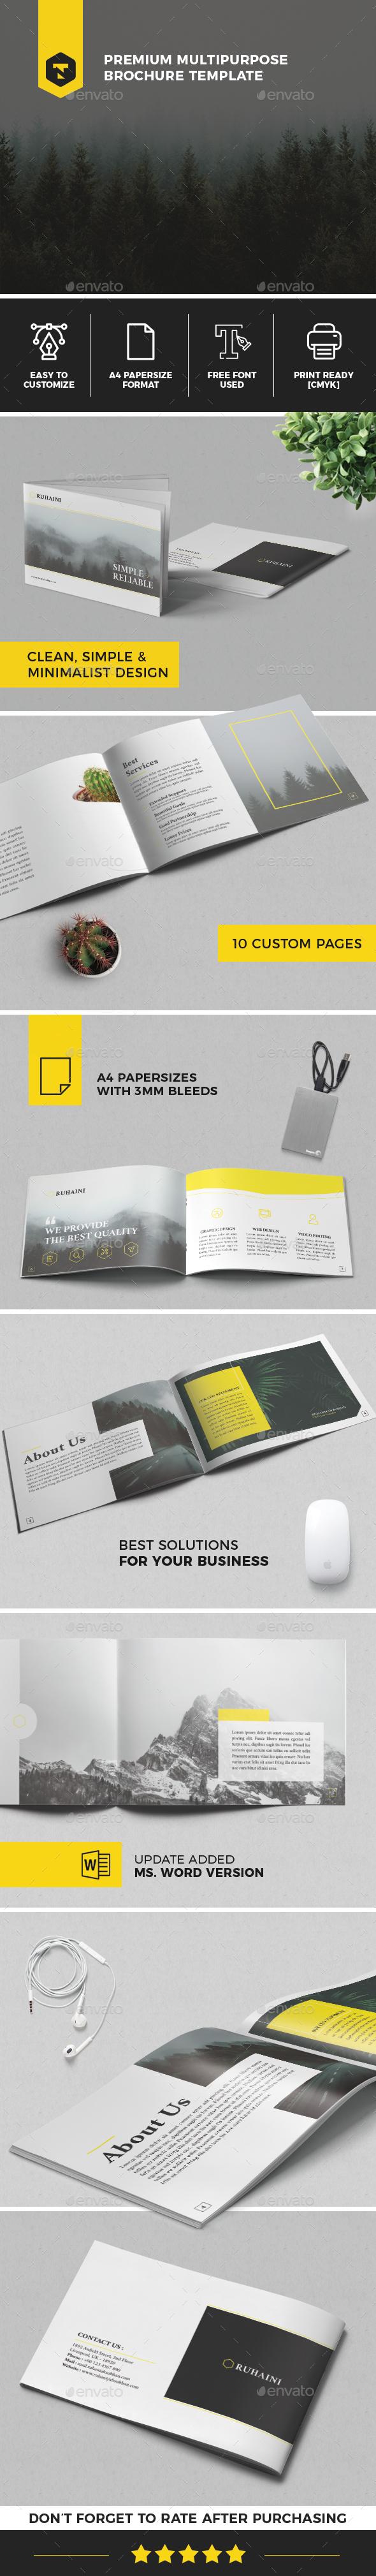 Multipurpose Corporate Brochure Template - Brochures Print Templates